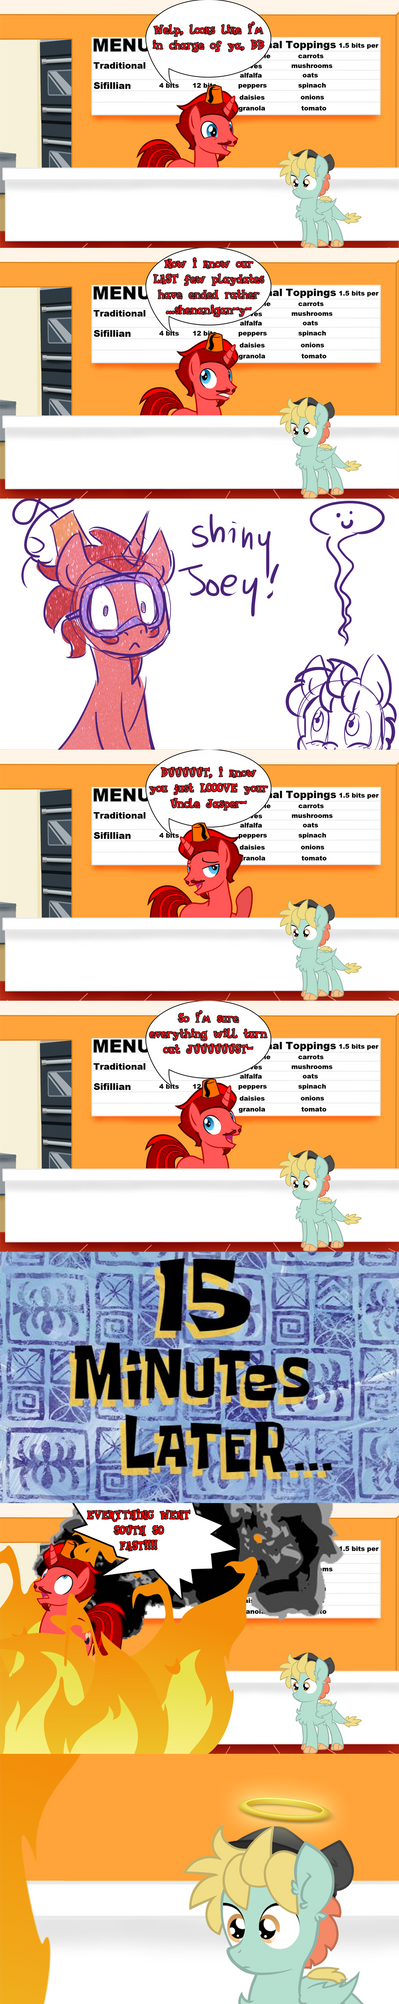 Jasper Babysits BB comic by DaJoestanator